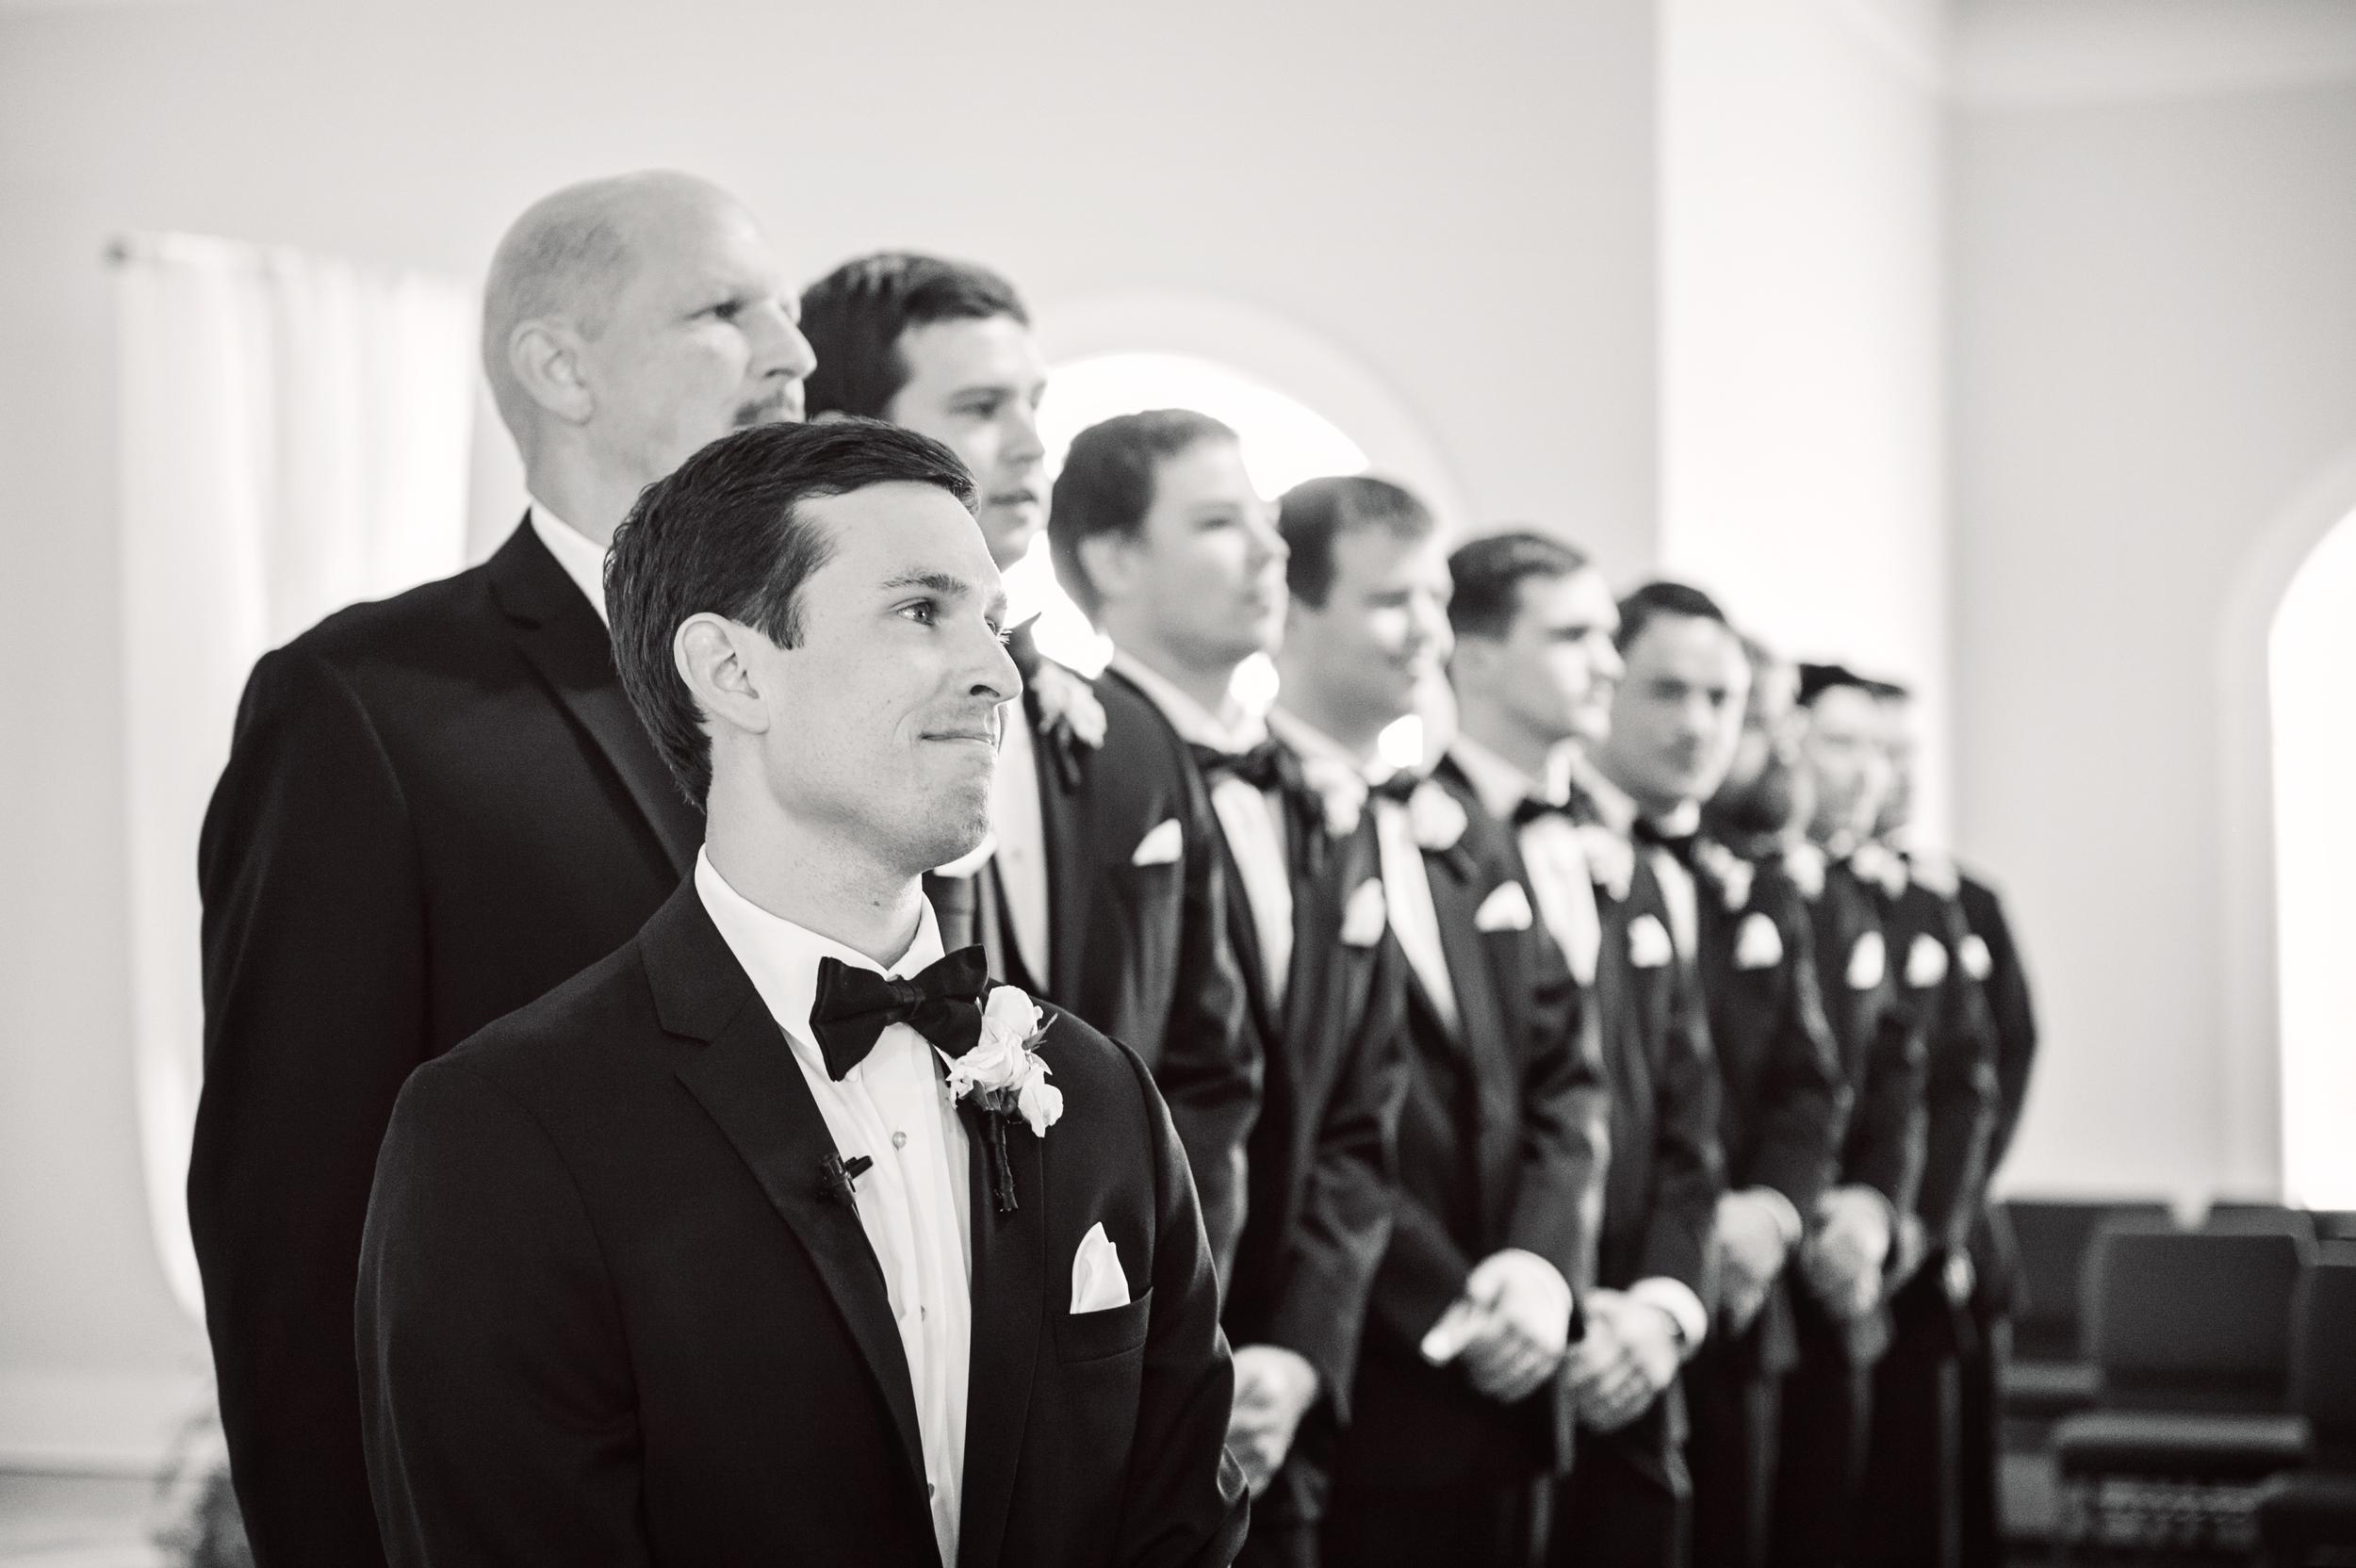 Kanavage_Wedding-27.jpg